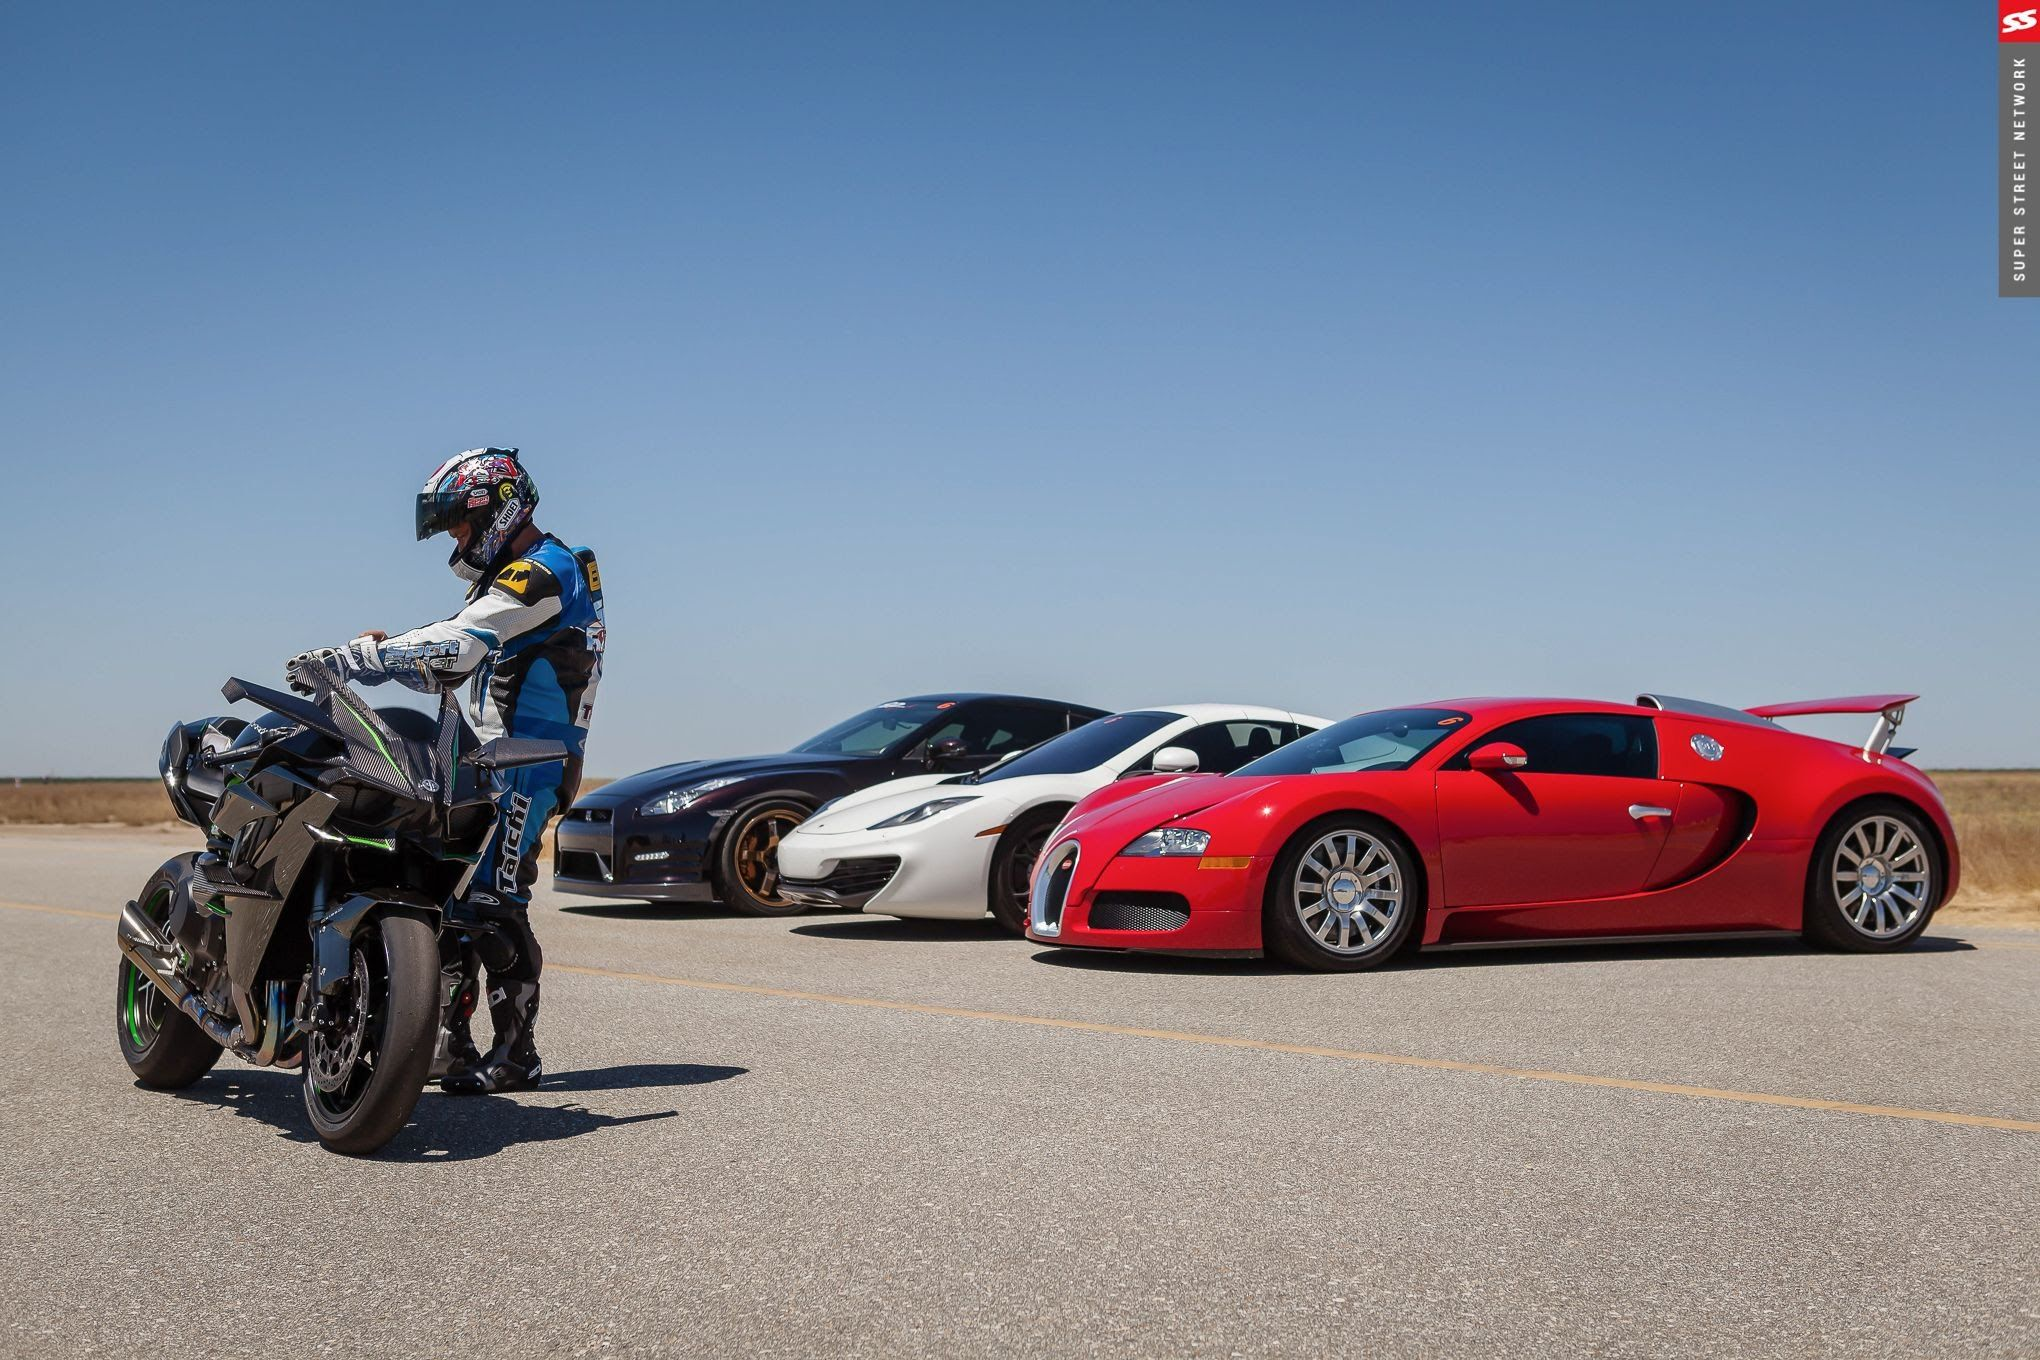 Full Video Hyperbike Races Ninja H2r Vs Bugatti Veyron 1350hp Gt